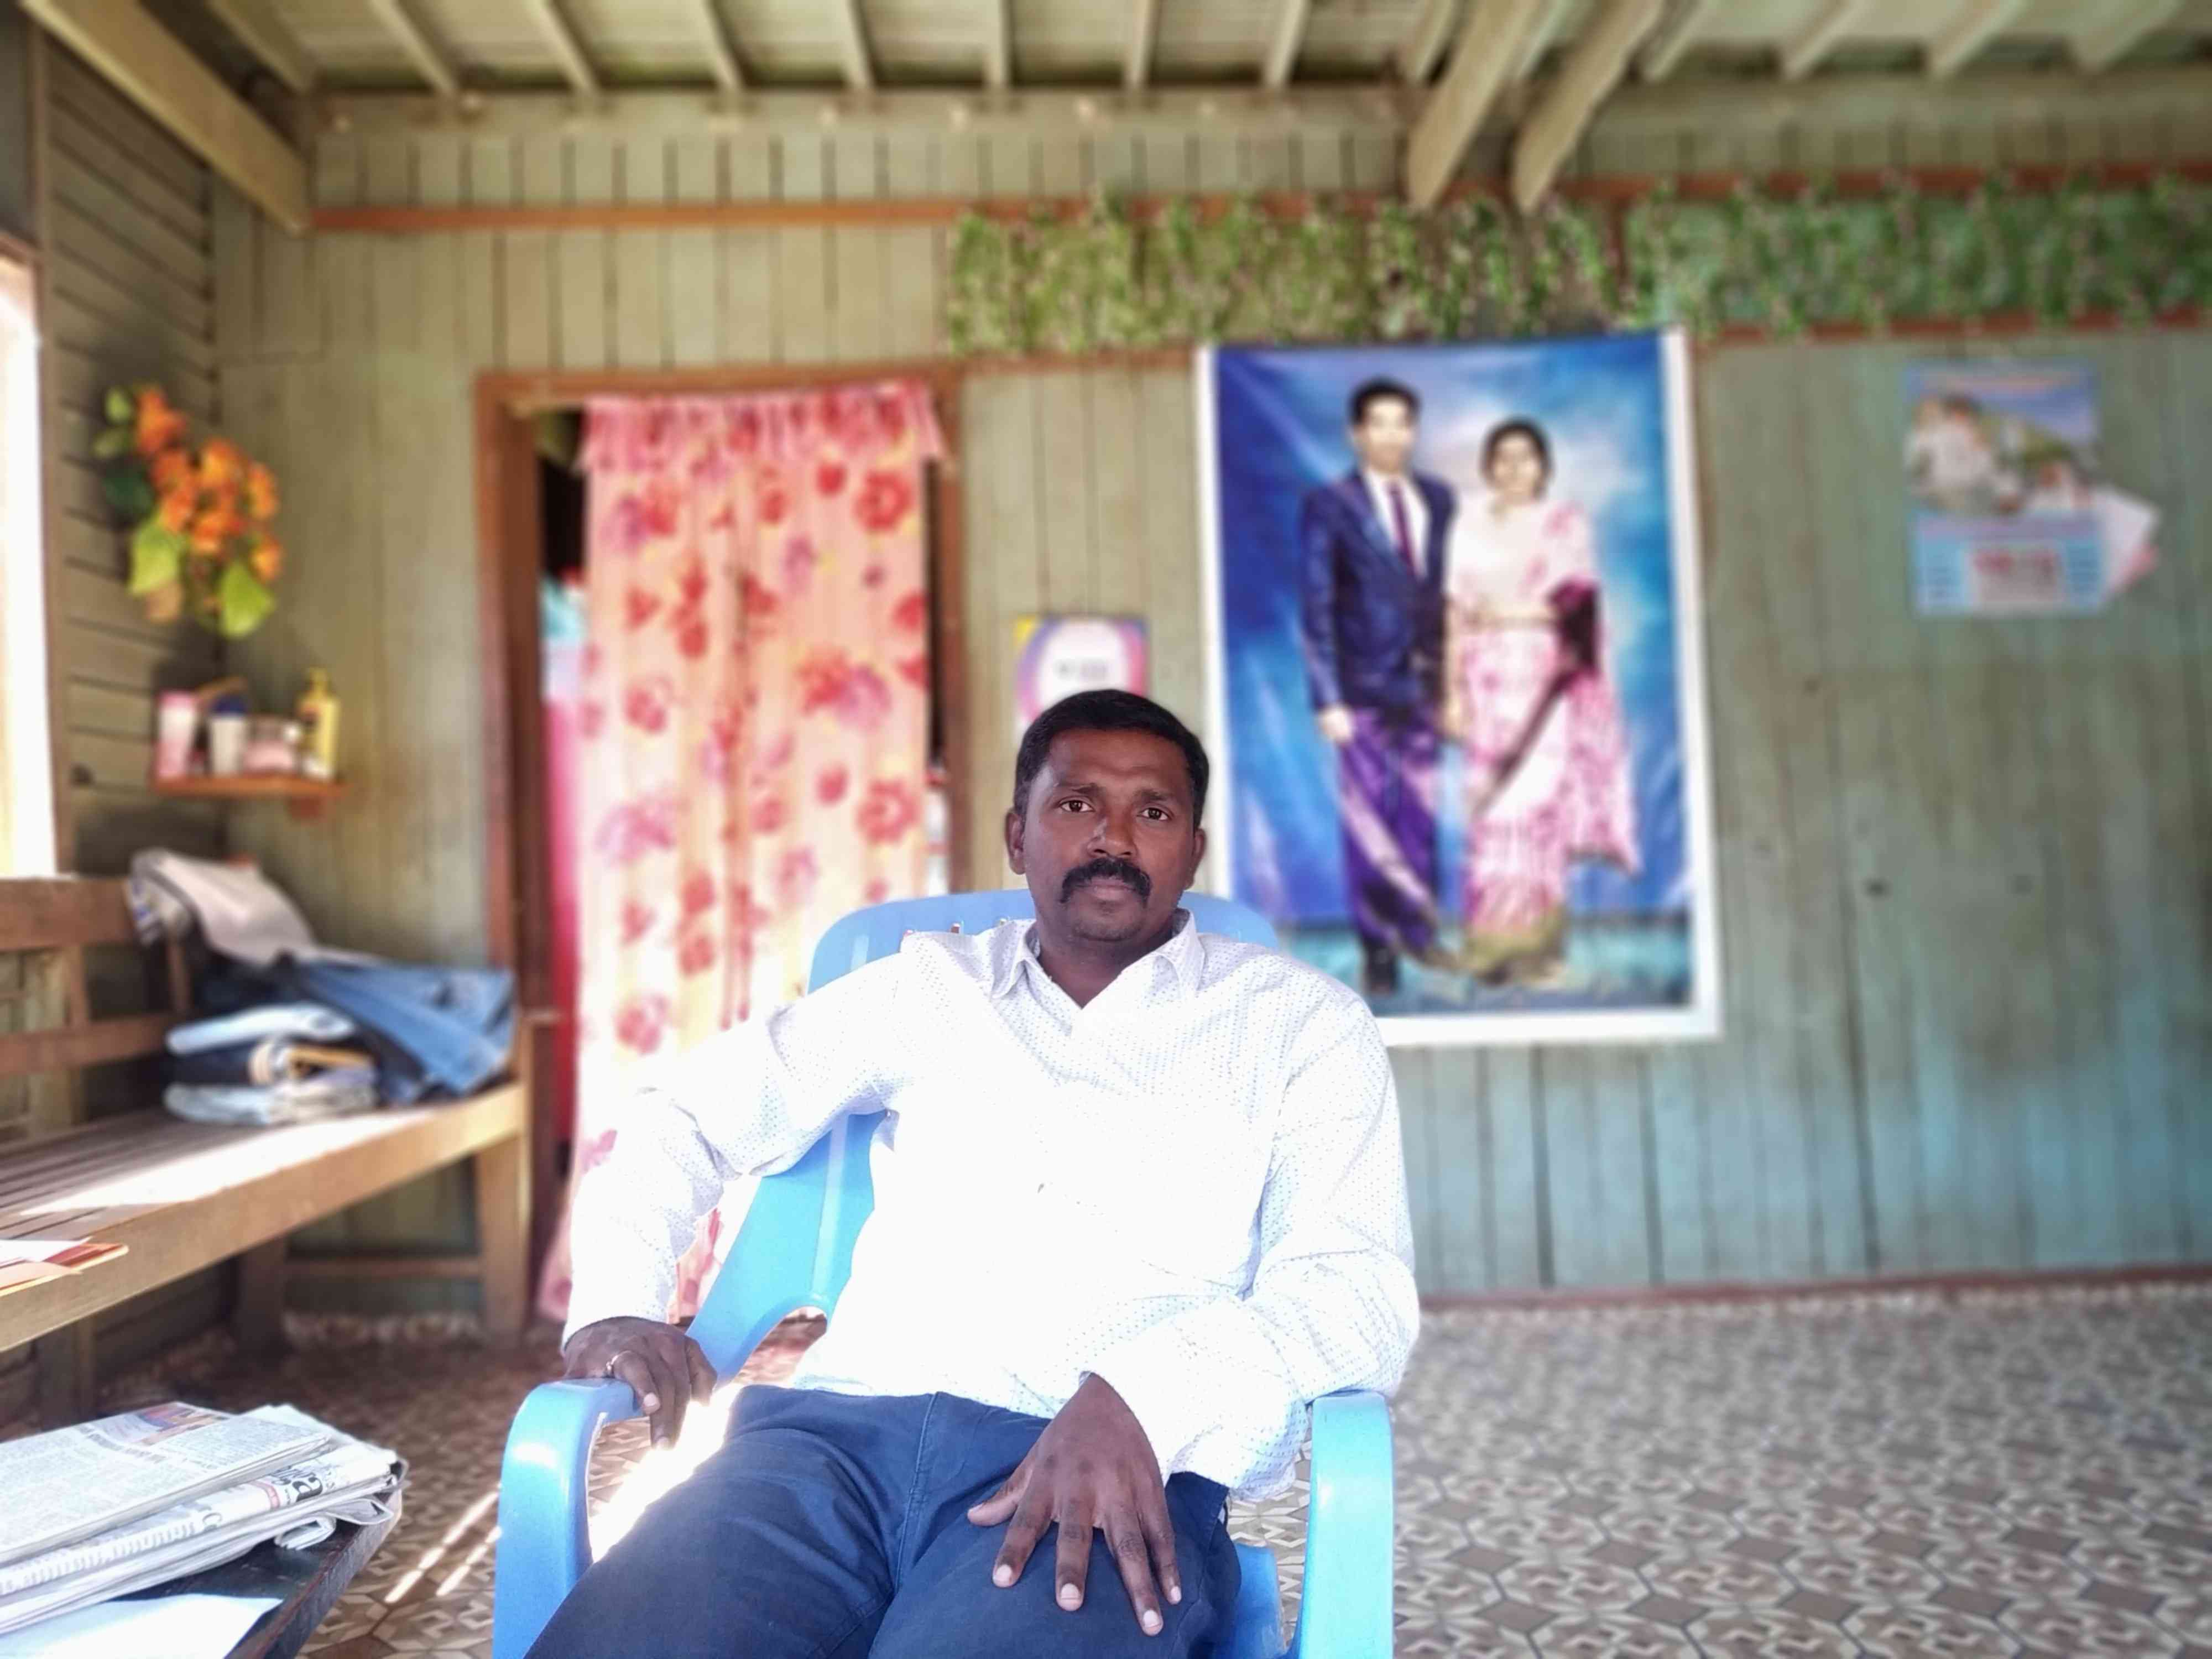 M Mohan fulfilled his childhood dream of going to Myanmar in December. Photo credit: Arunabh Saikia